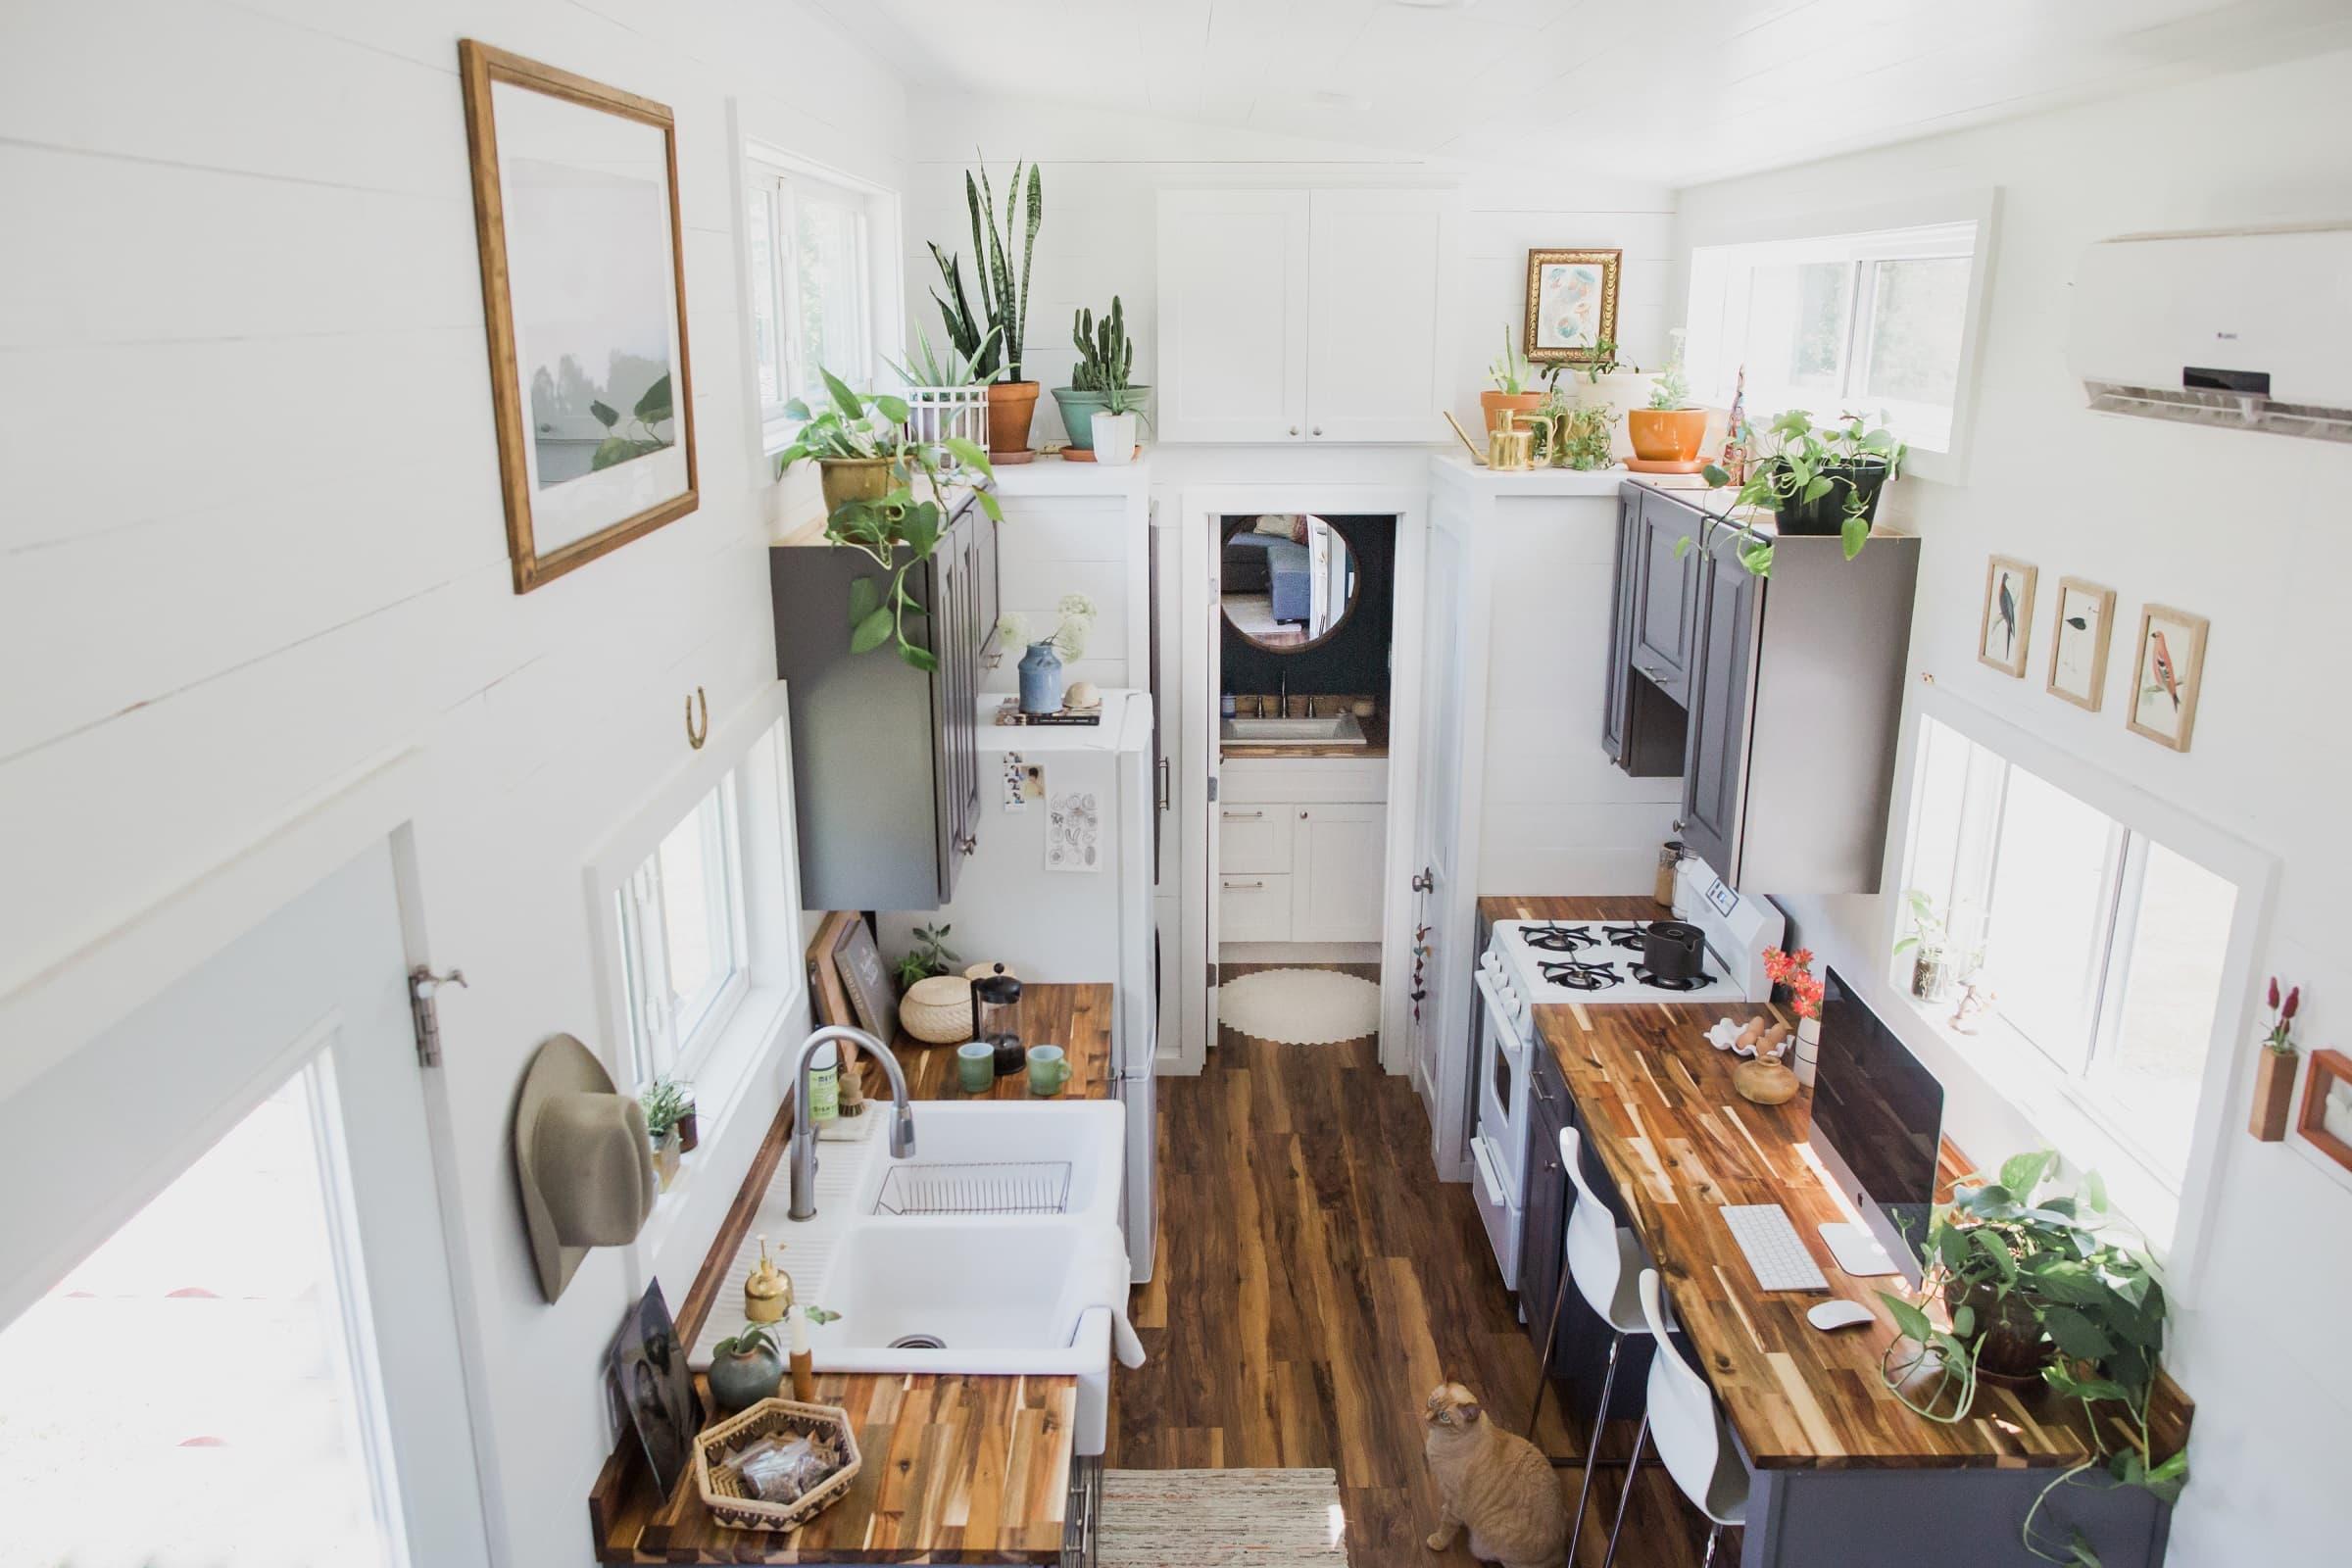 American Tiny House - Tiny Houses| Big Impact